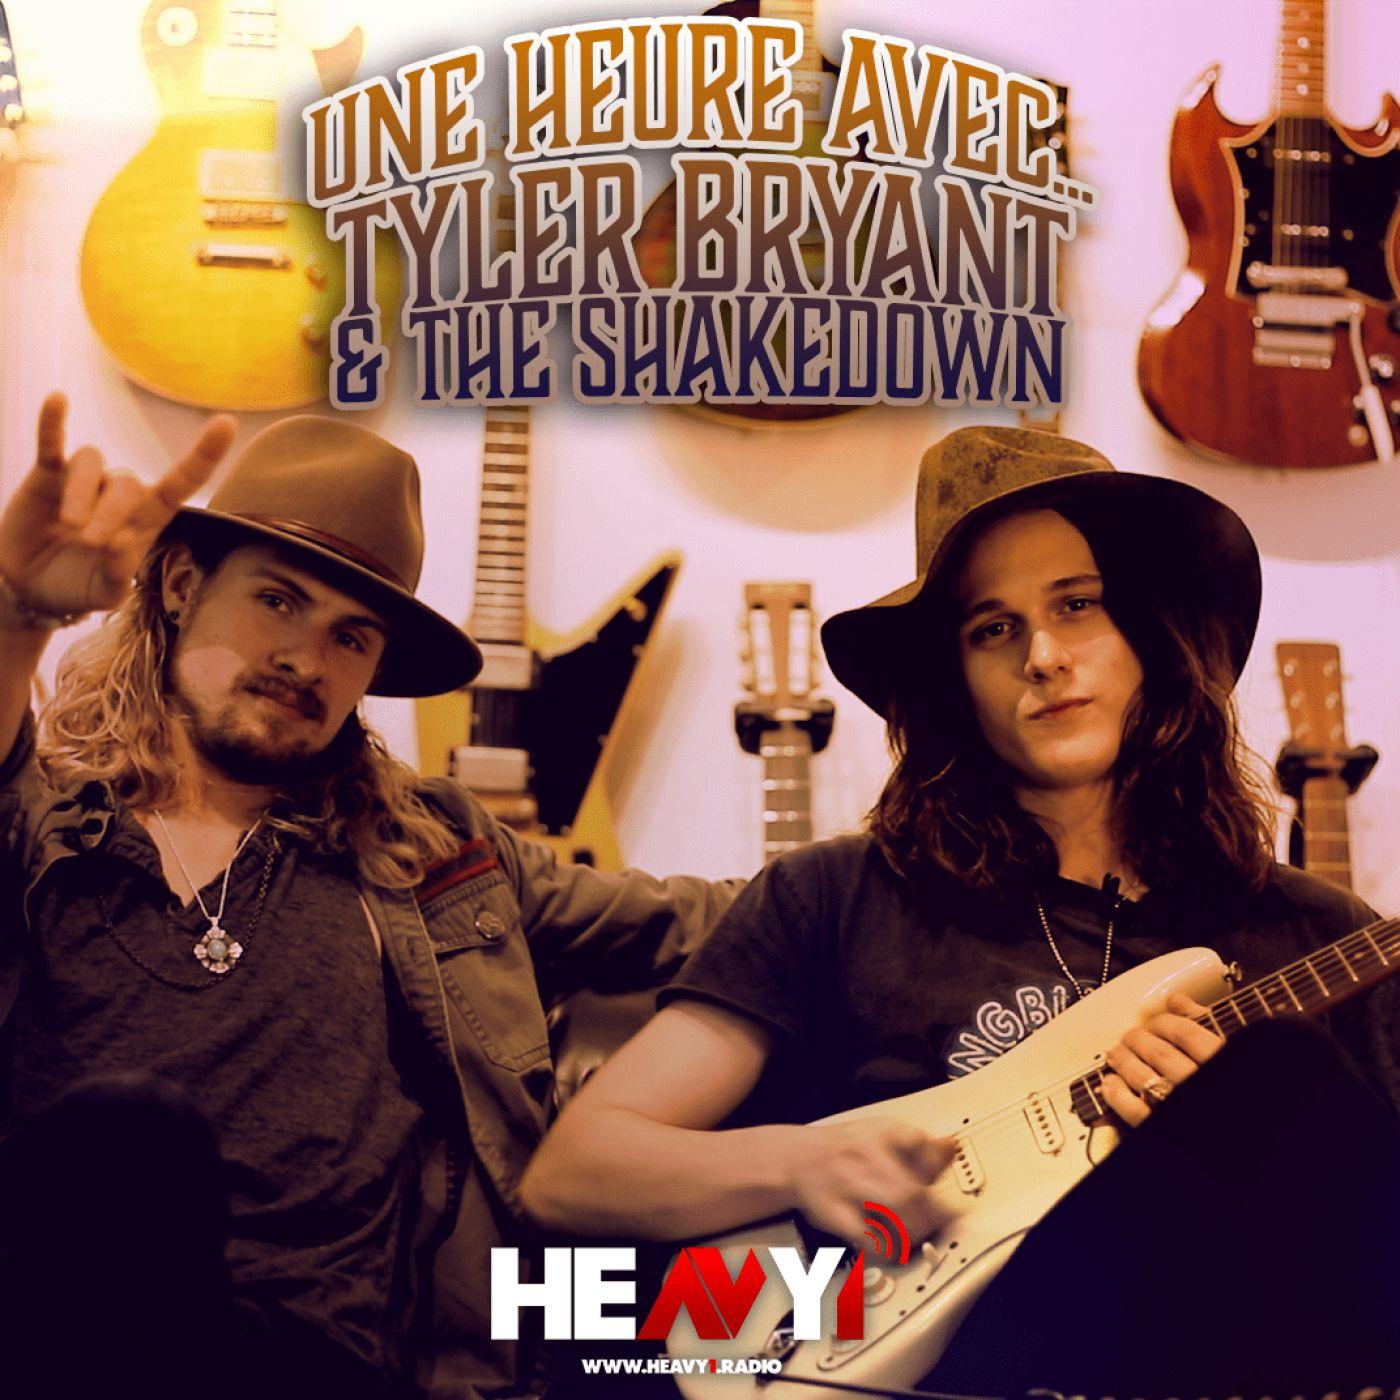 Une heure avec... Tyler Bryant & The Shakedown